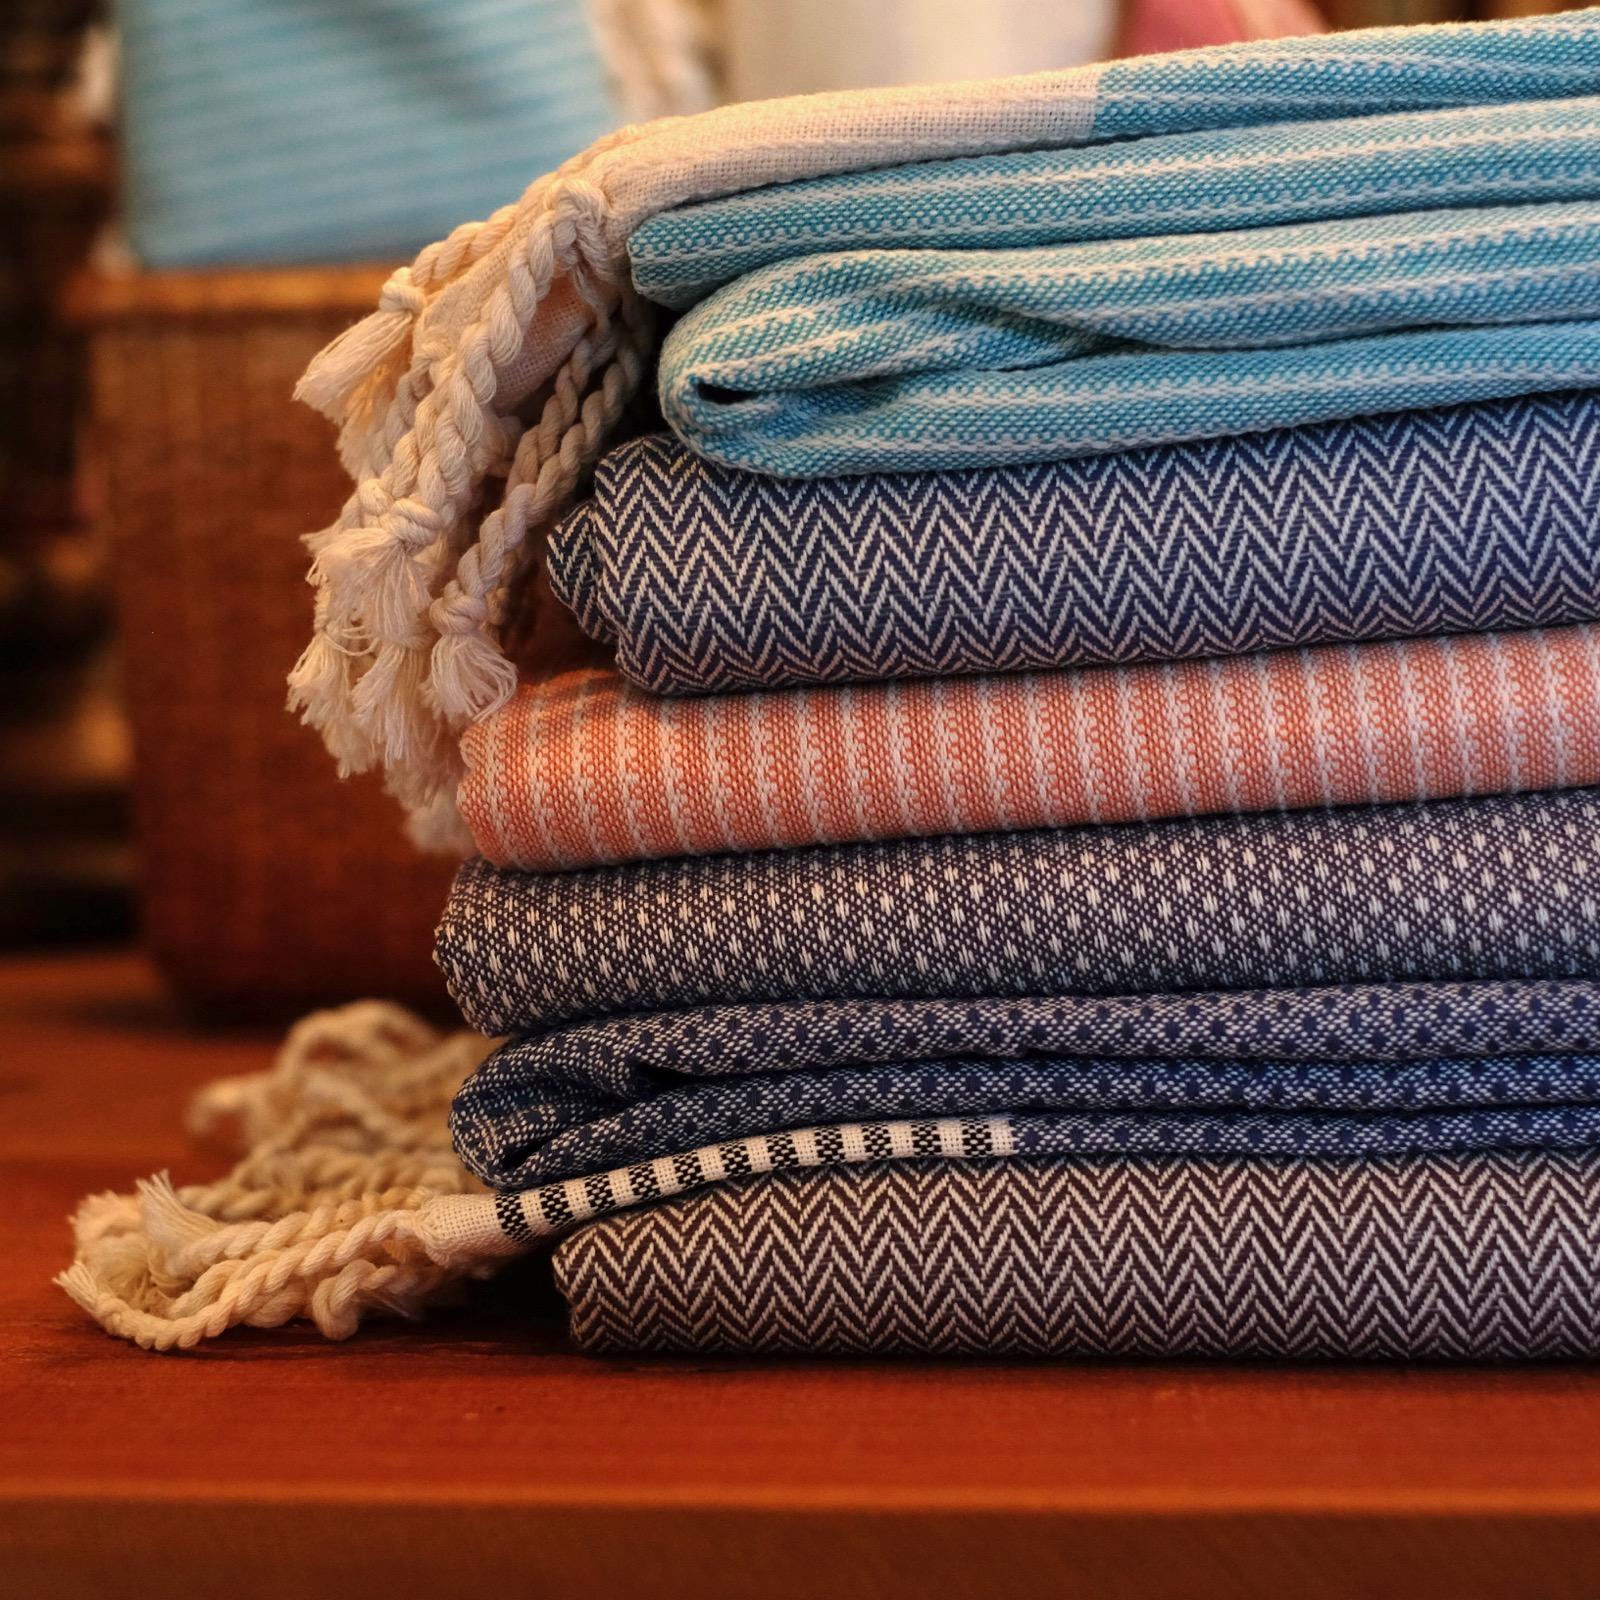 JonesAndCompany-Fouta-blankets.jpg